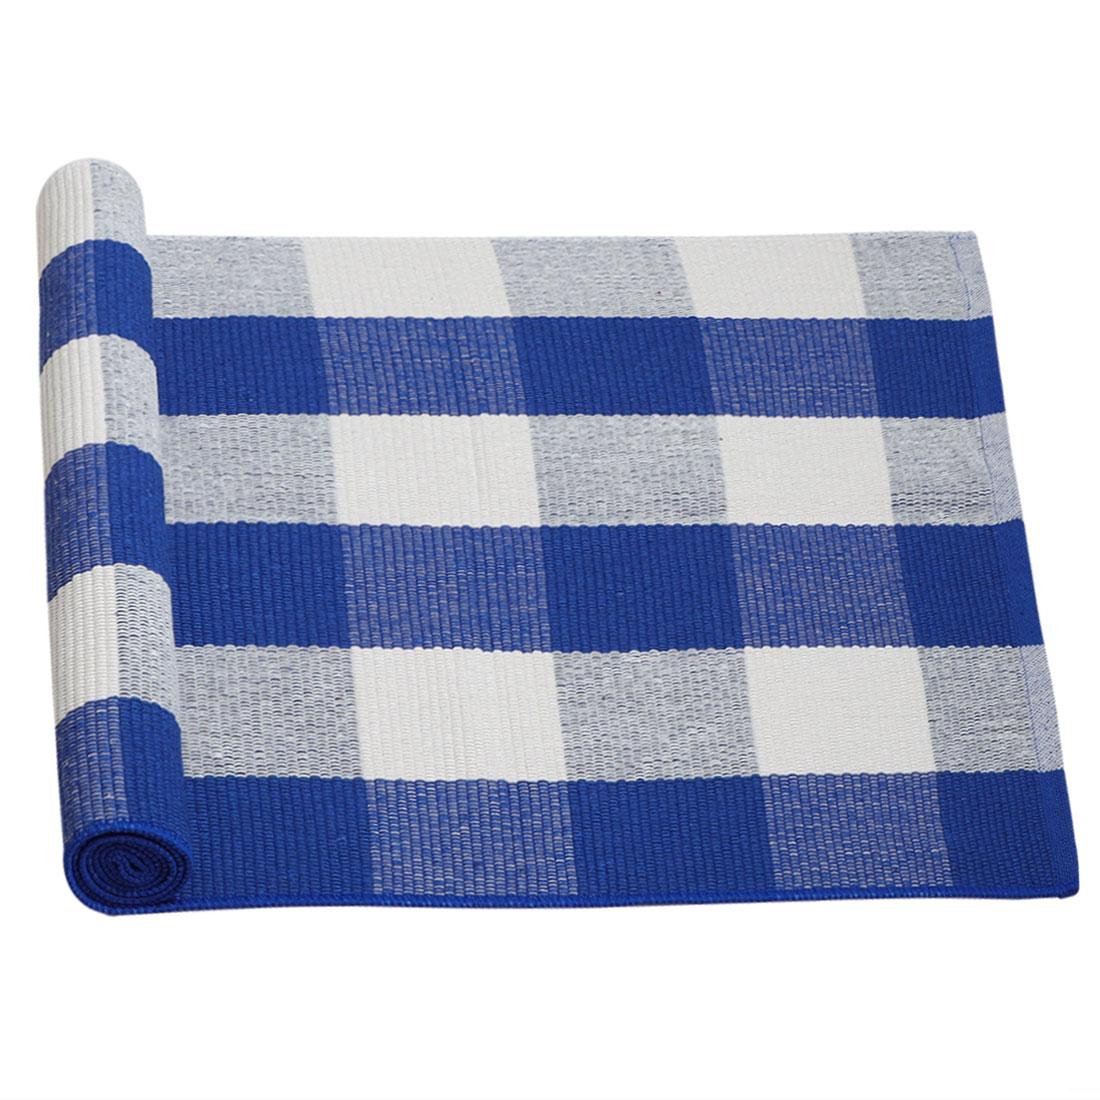 Cotton Checkered Plaid Floor Area Rug Runner Carpet Indoor Outdoor Blue White